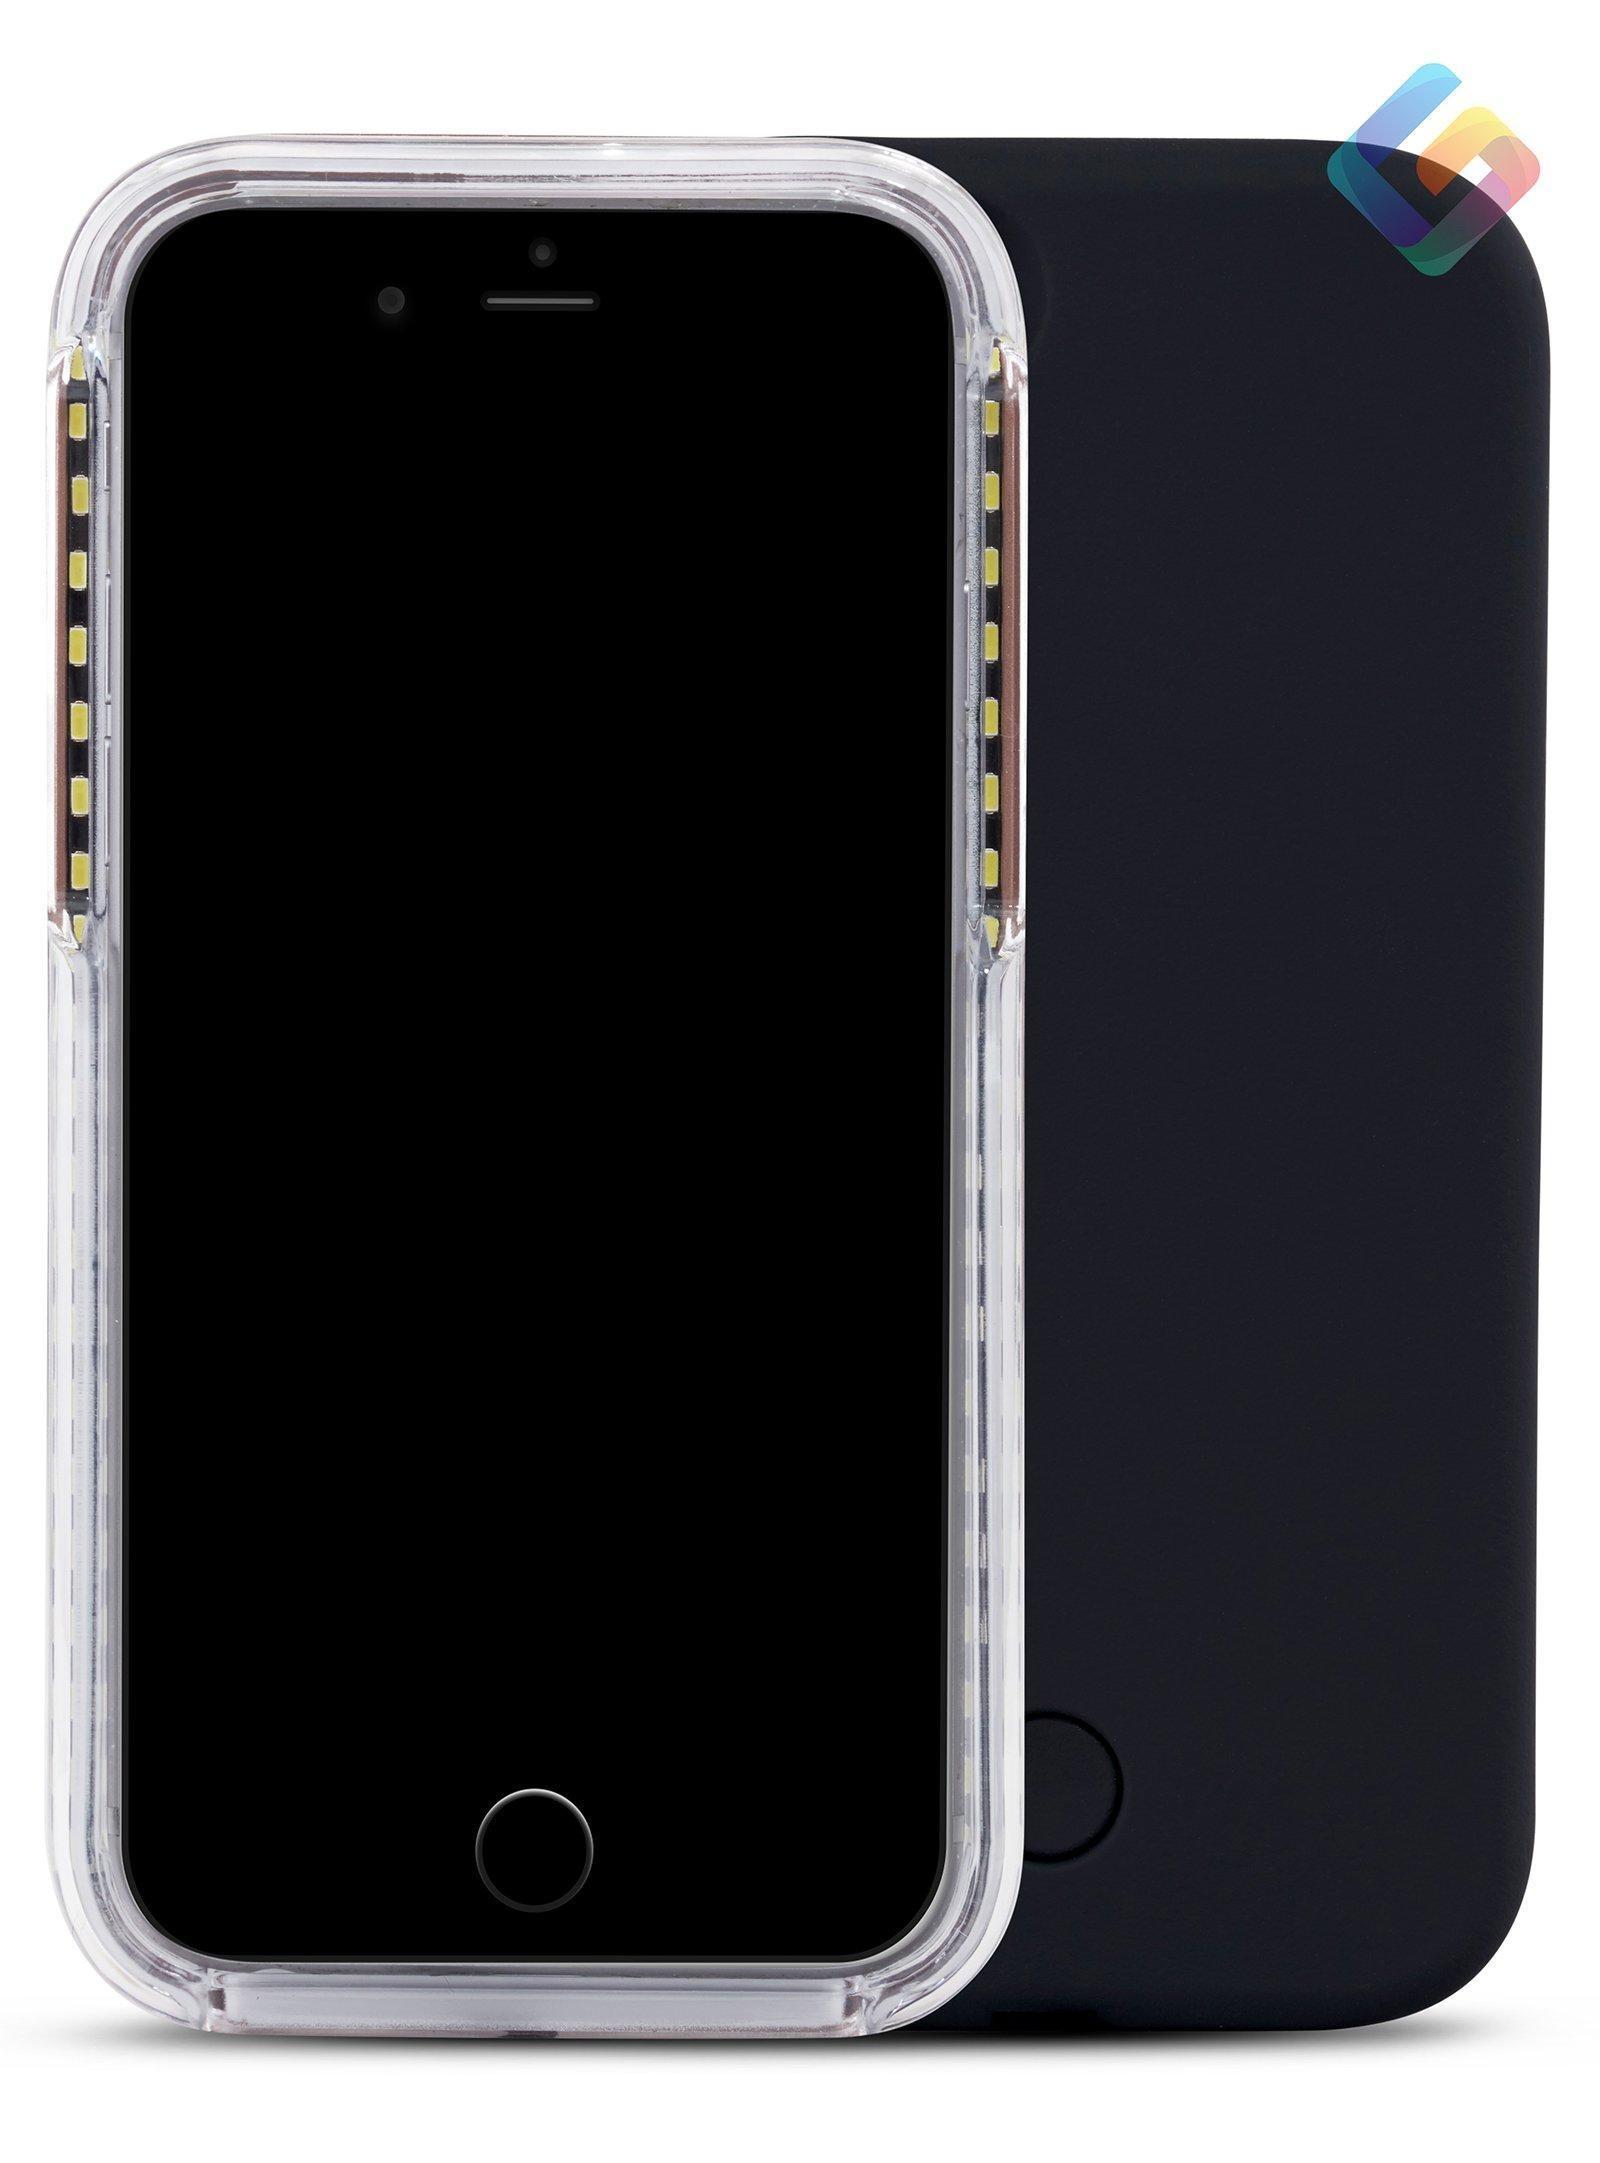 Online Store Iphone 6s Plus Case Gizmonto Led Light Up Luminous 6 Selfie Cell Phone Illuminated Back